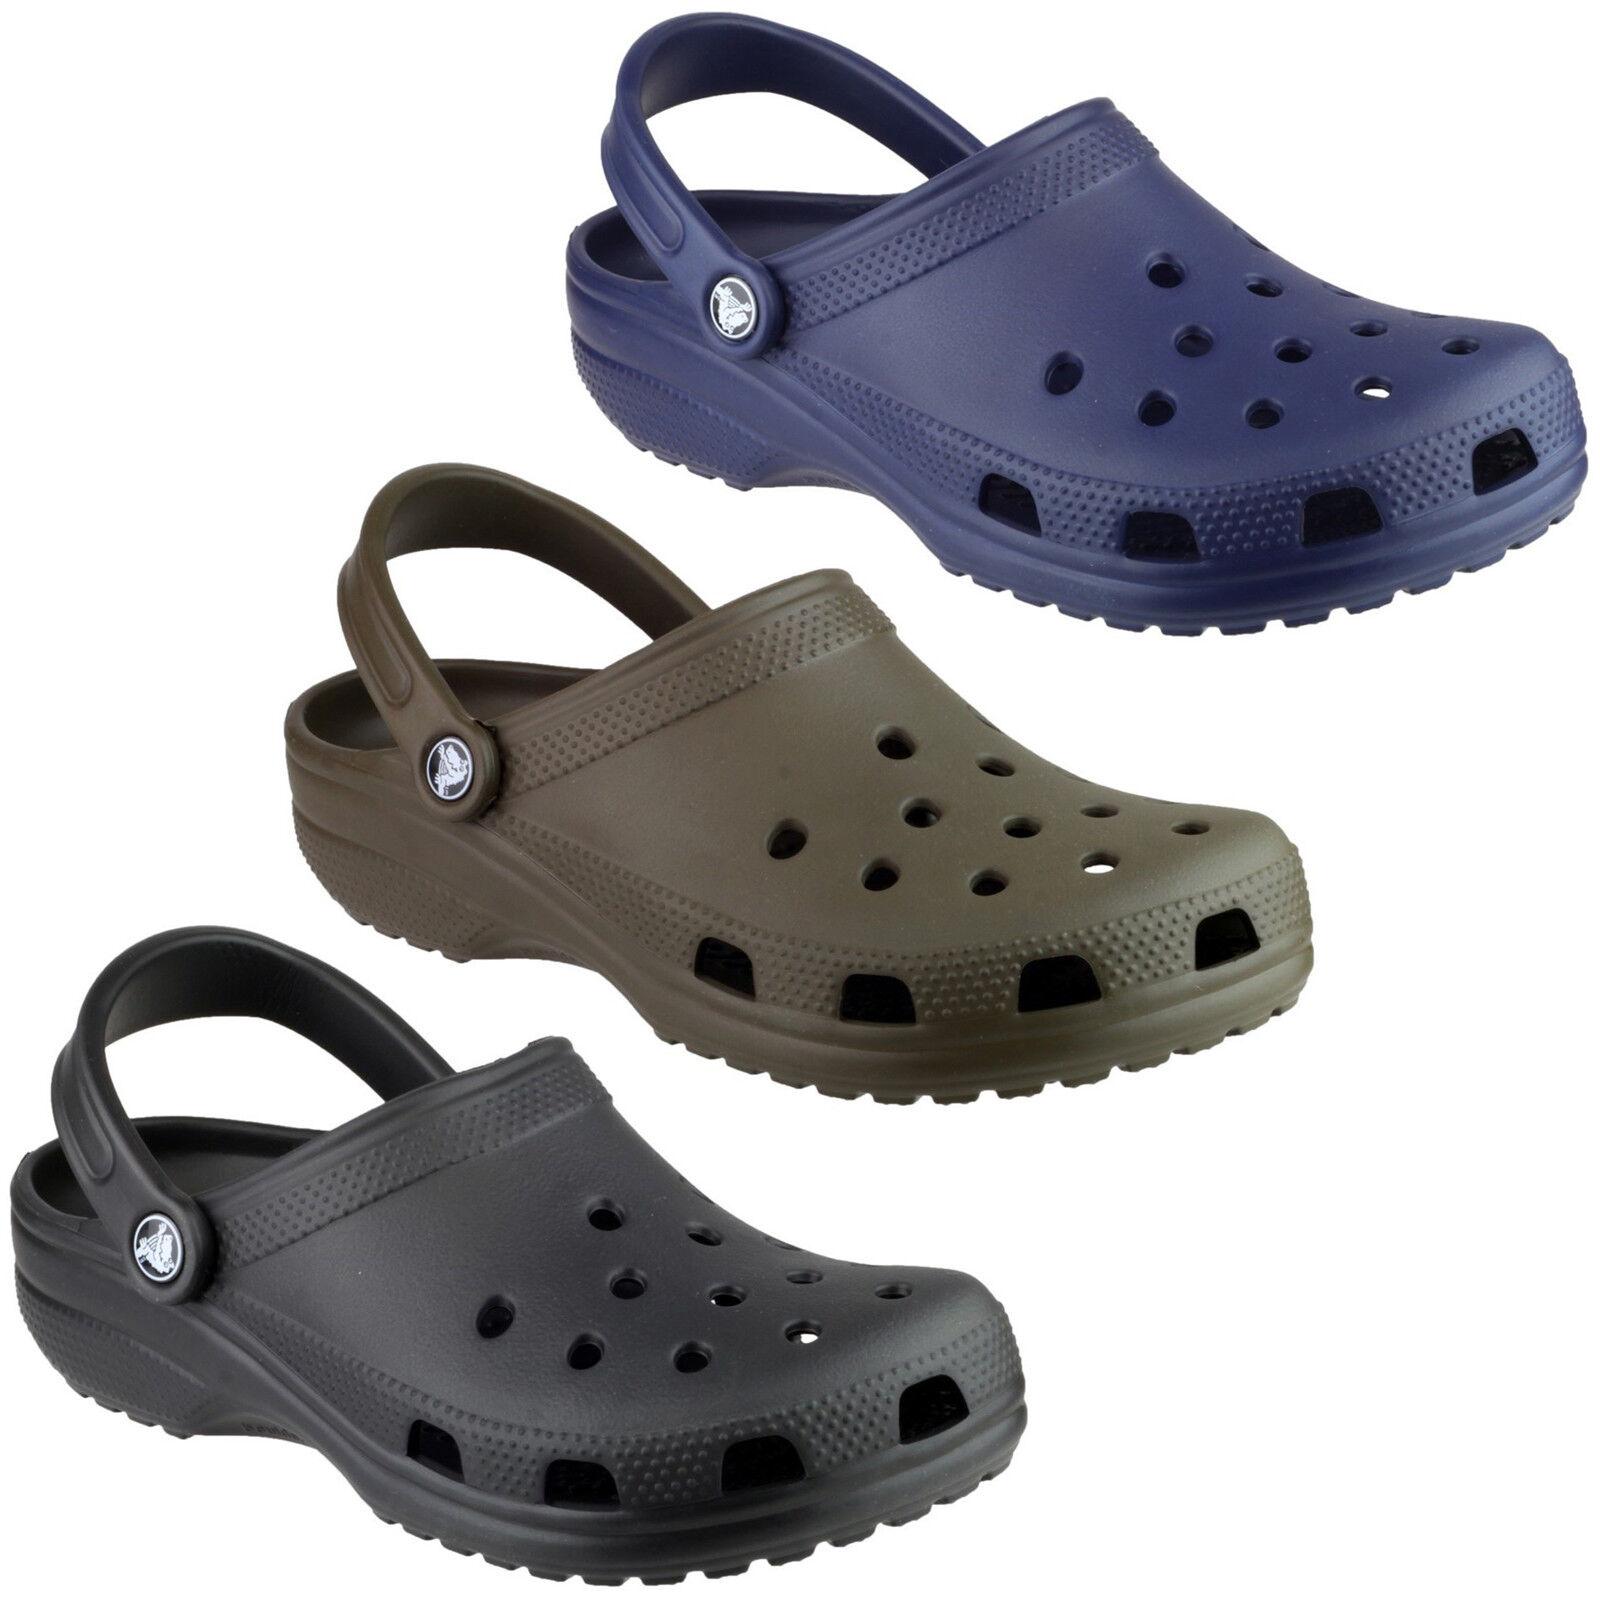 Crocs Unisex Classico Zoccoli Croslite Leggero Cinghia men women Sandali shoes